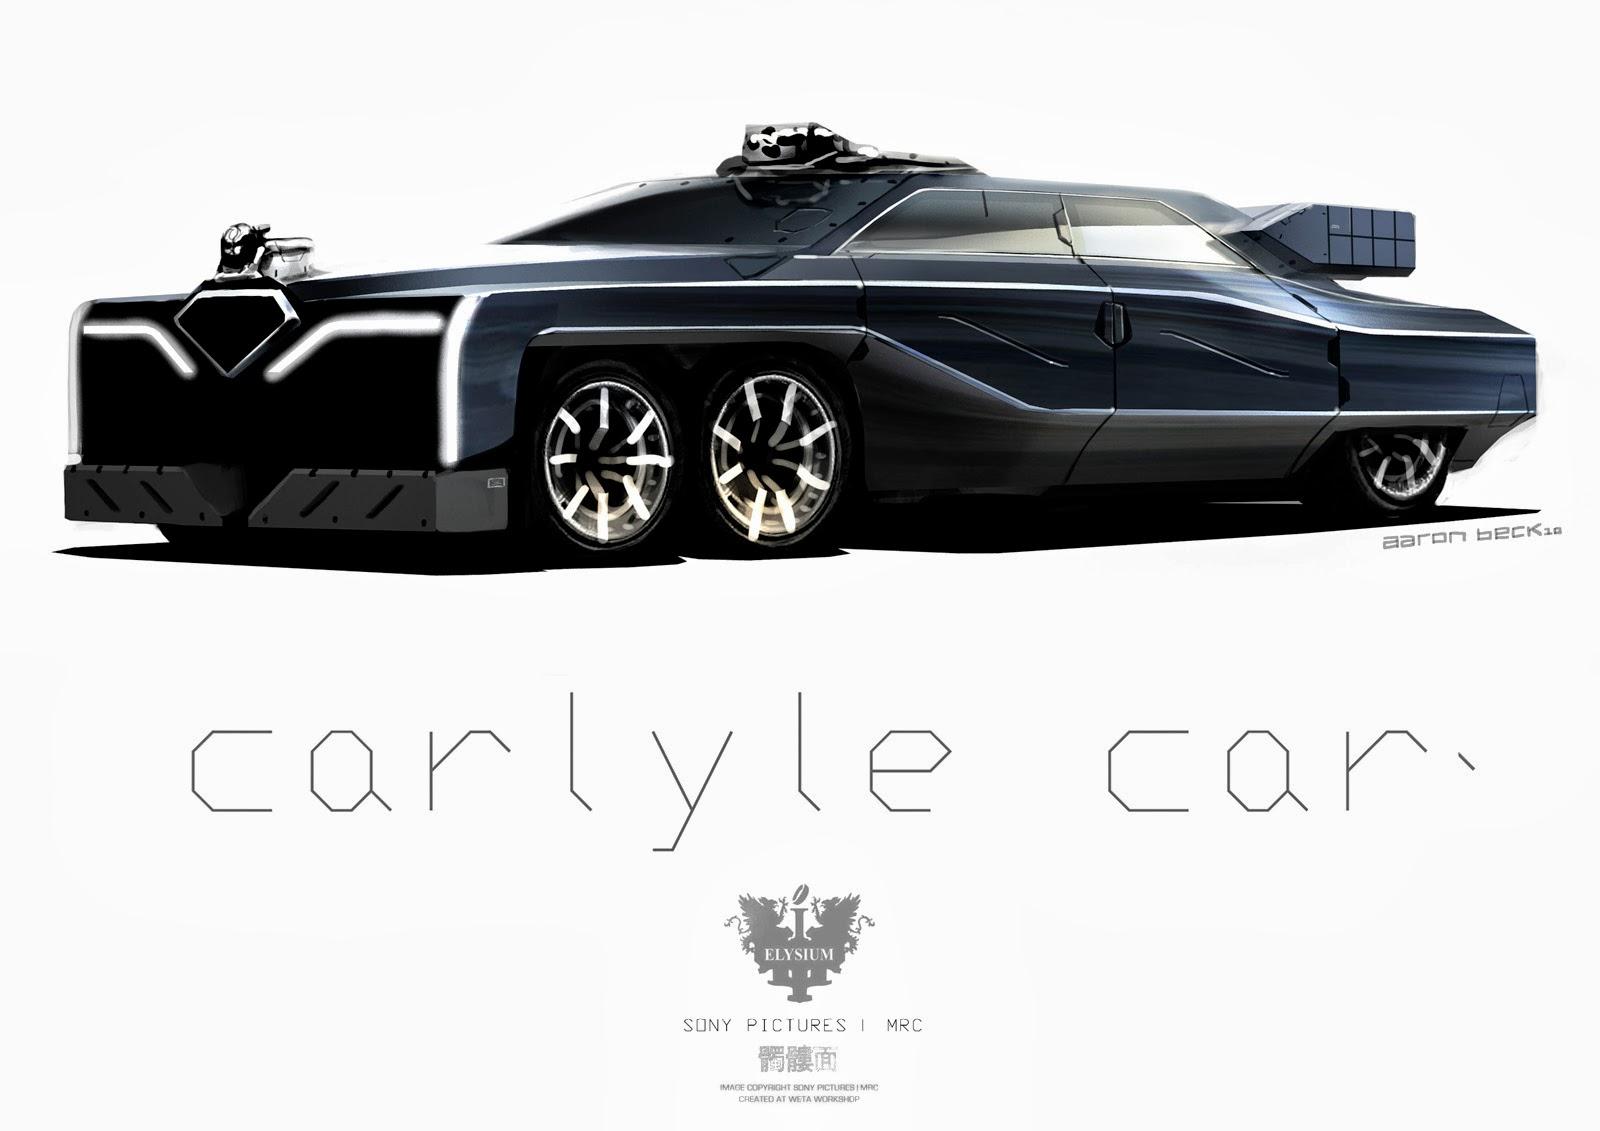 carlyle_car.jpg